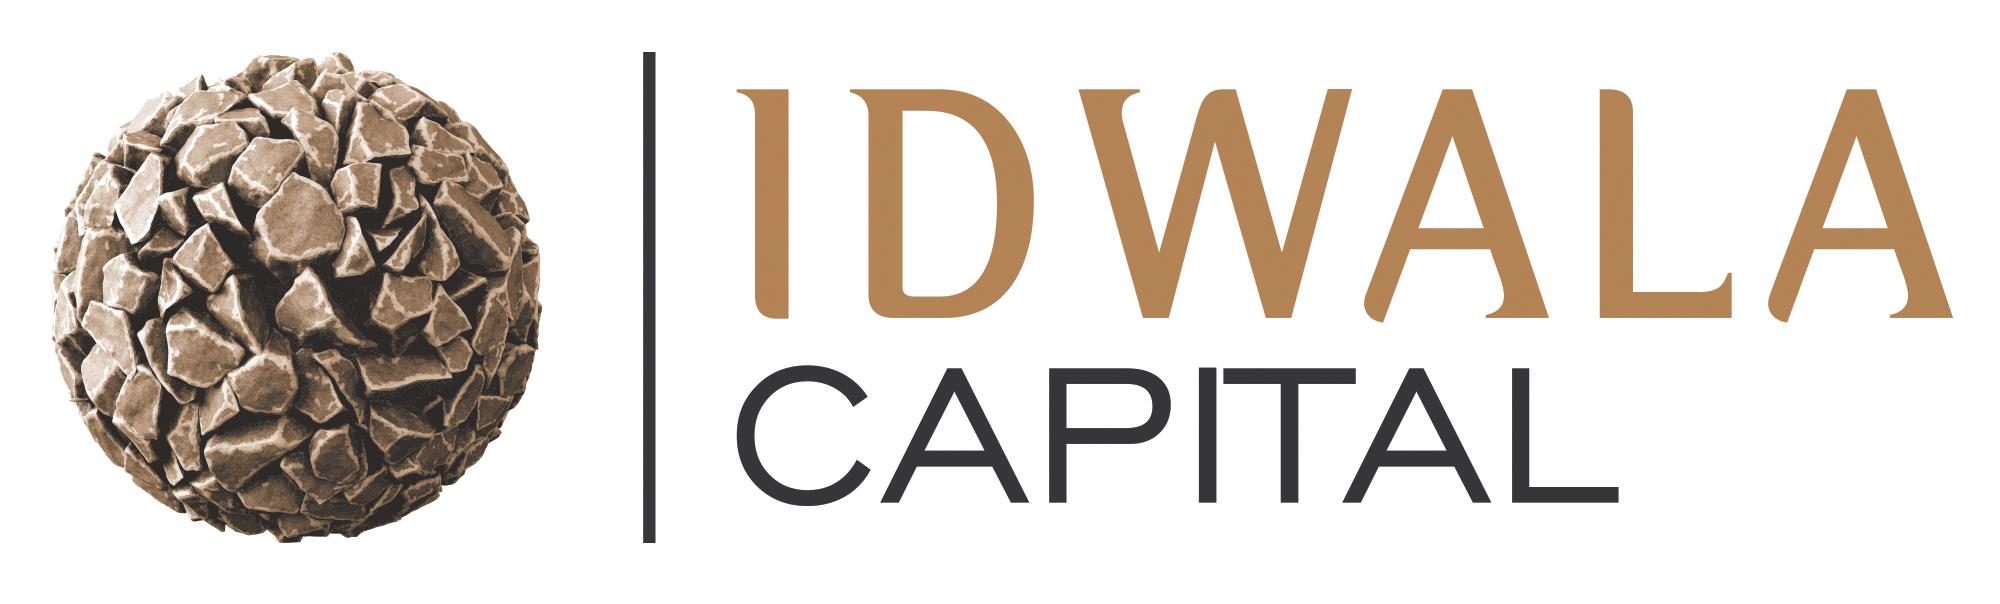 Idwala Capital